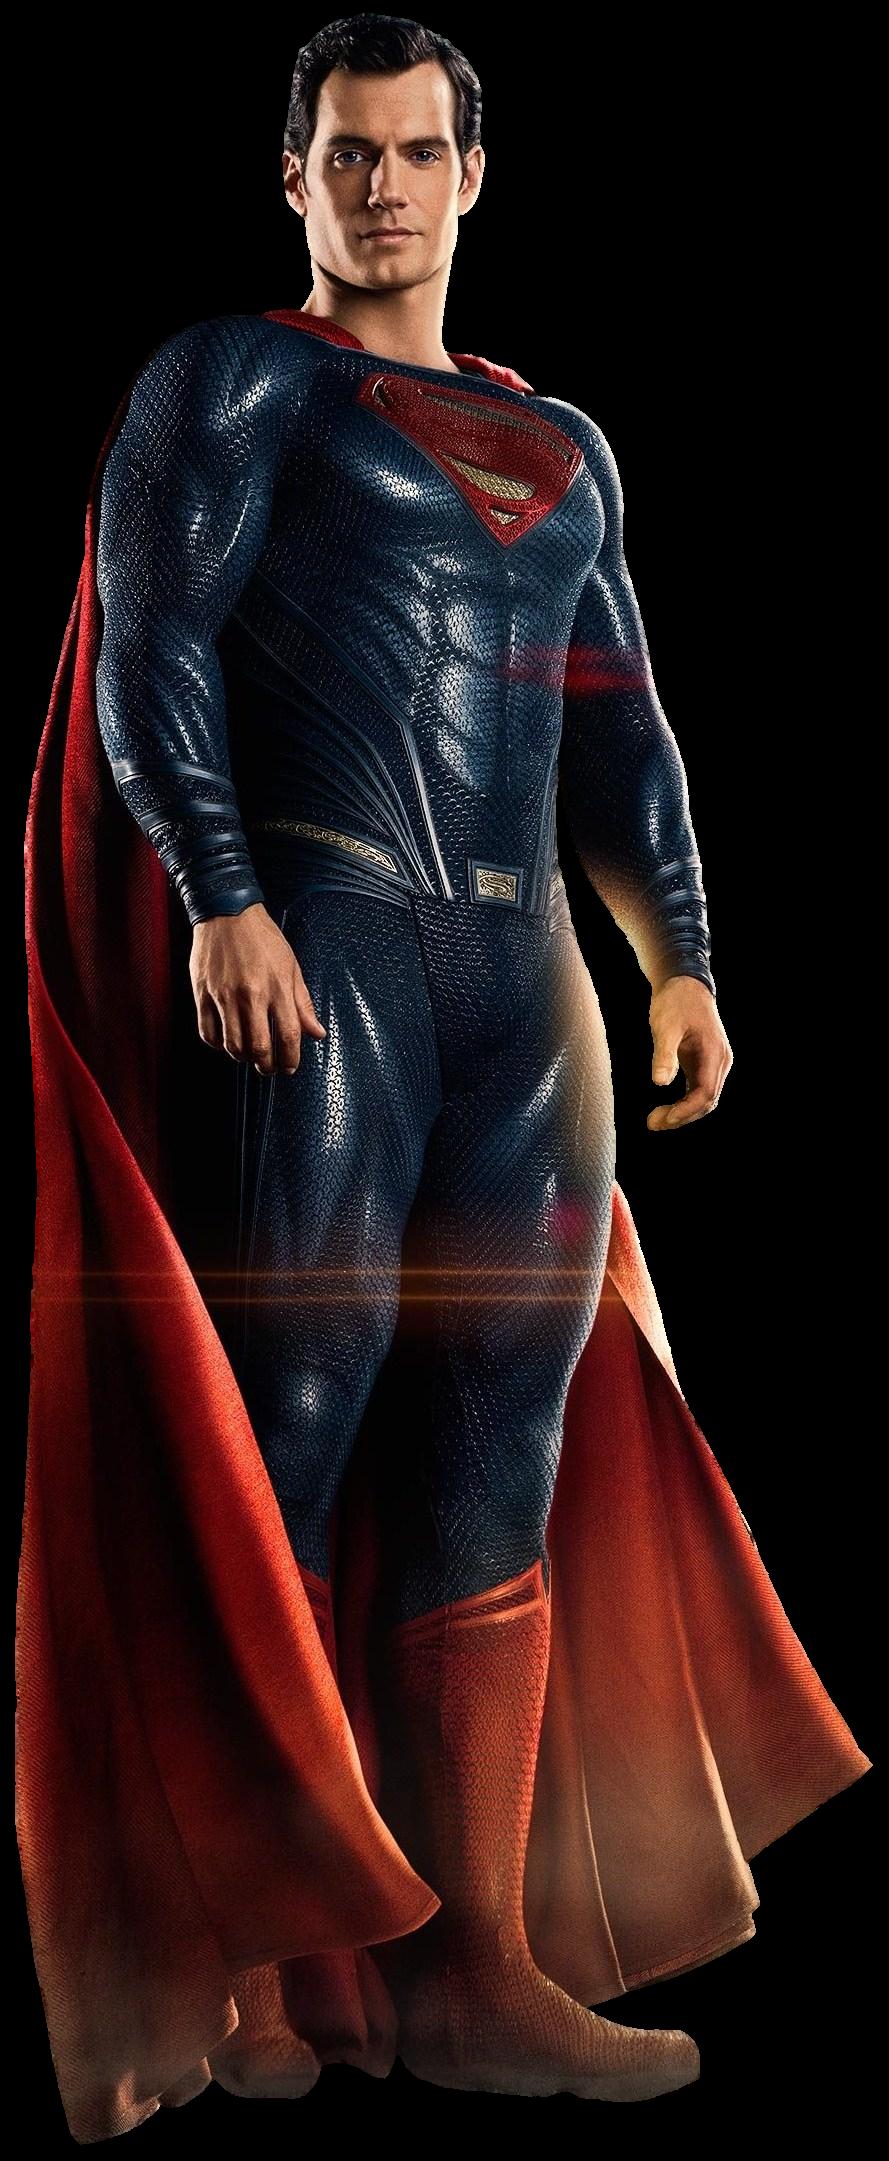 Justice Leagues Superman - Transparent Background! by Camo ...